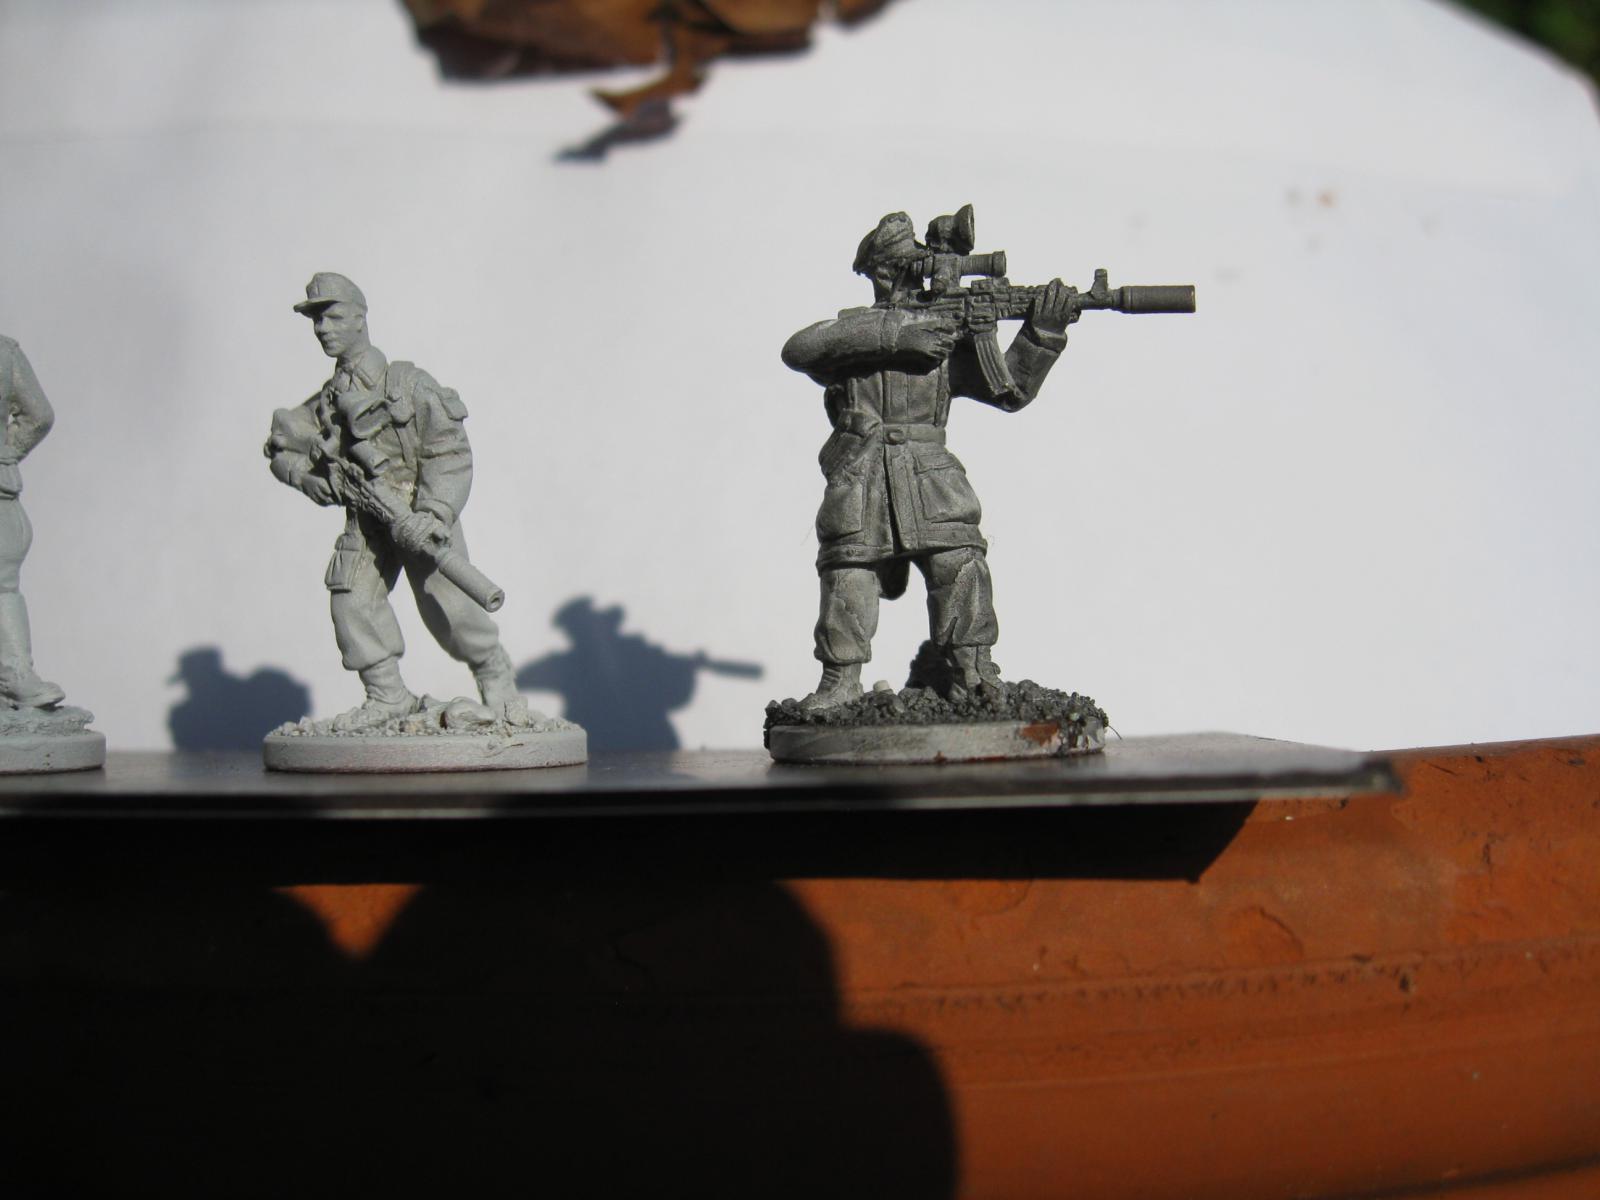 CP Models Miniatures - Seite 2 Kn1y-4k-b73c